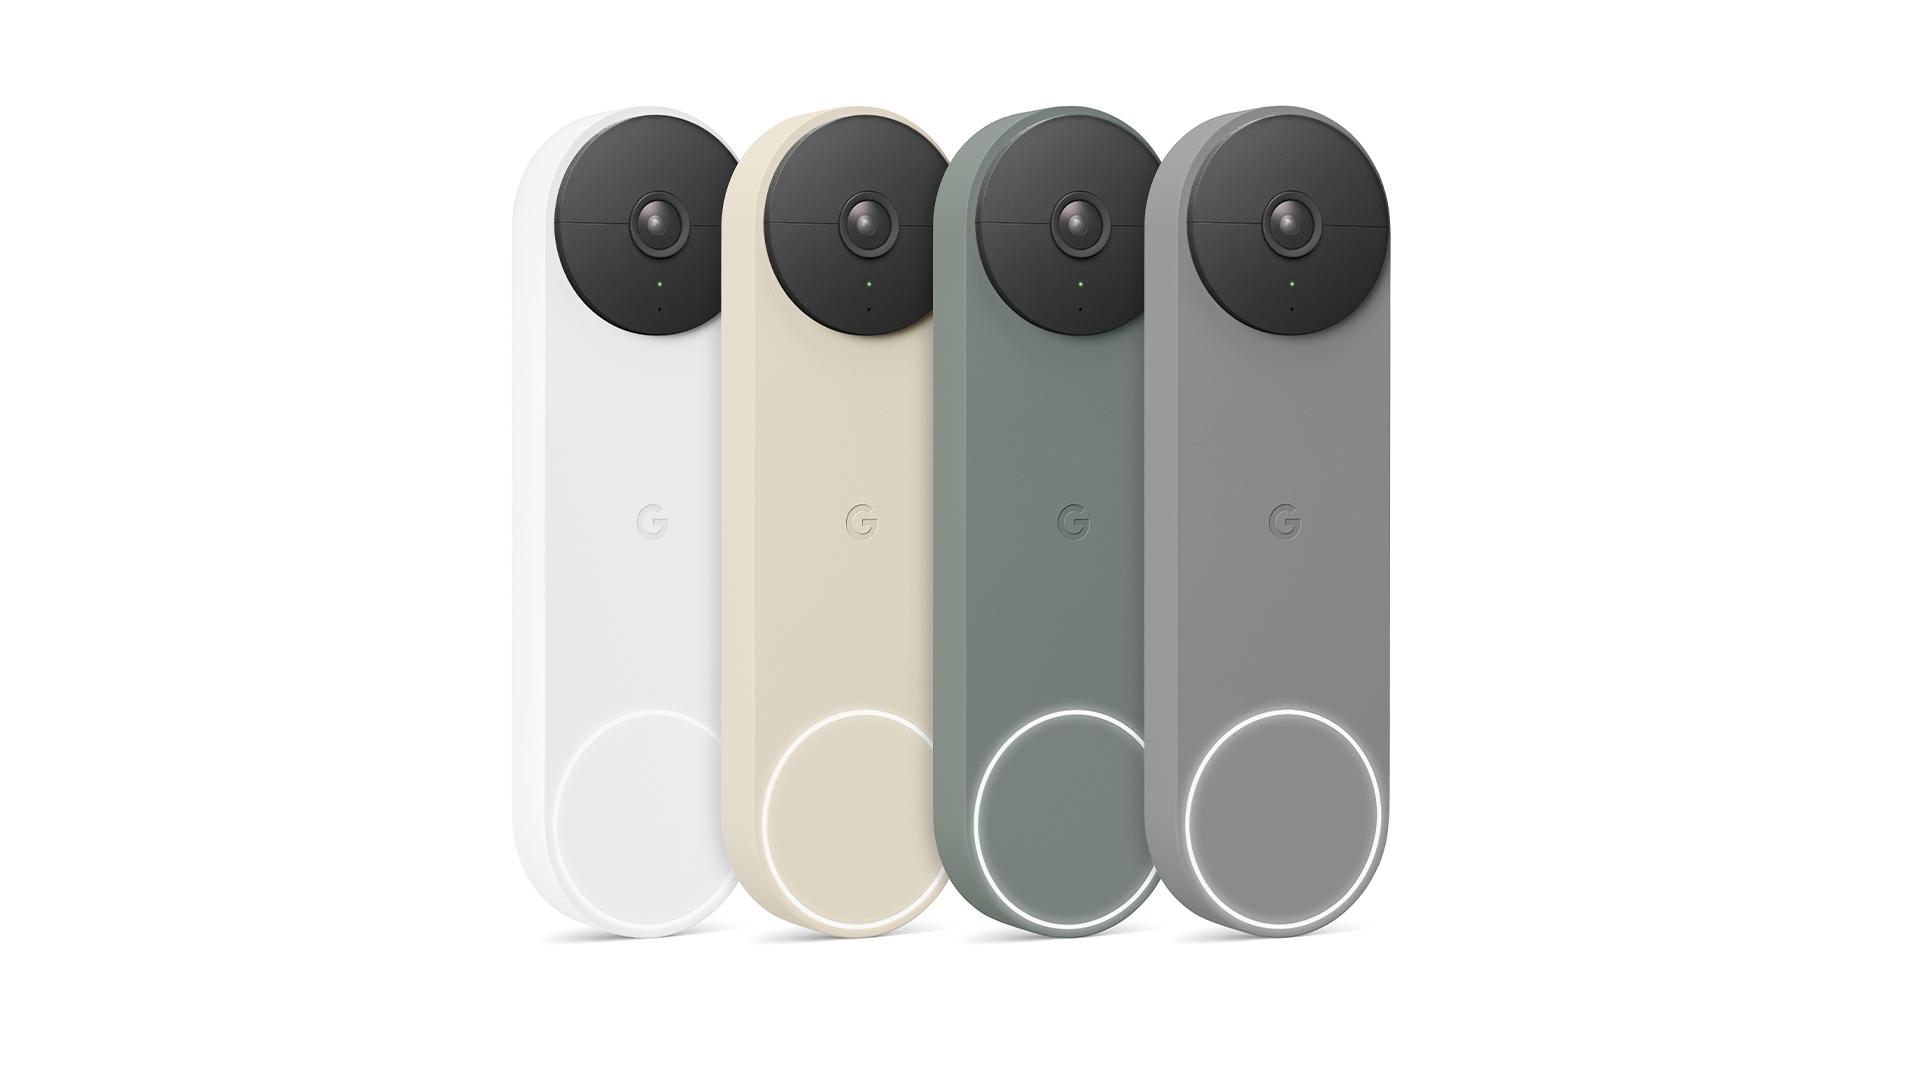 The Google Nest Doorbell in four colors.